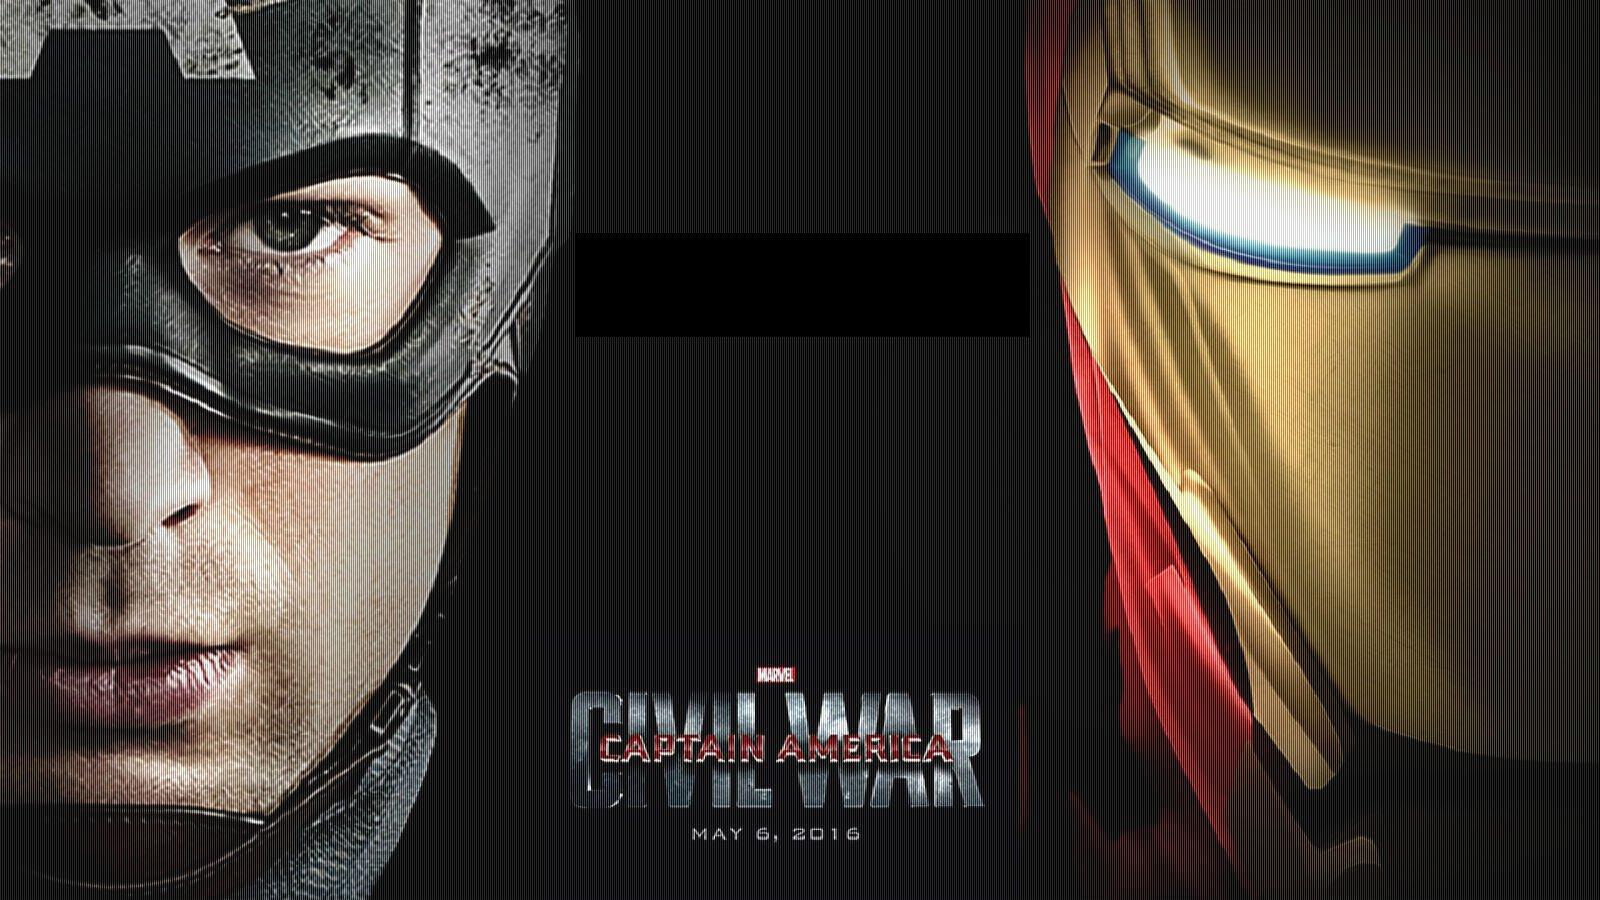 CAPTAIN AMERICA 3 Civil War marvel superhero action fighting 1cacw 1600x900